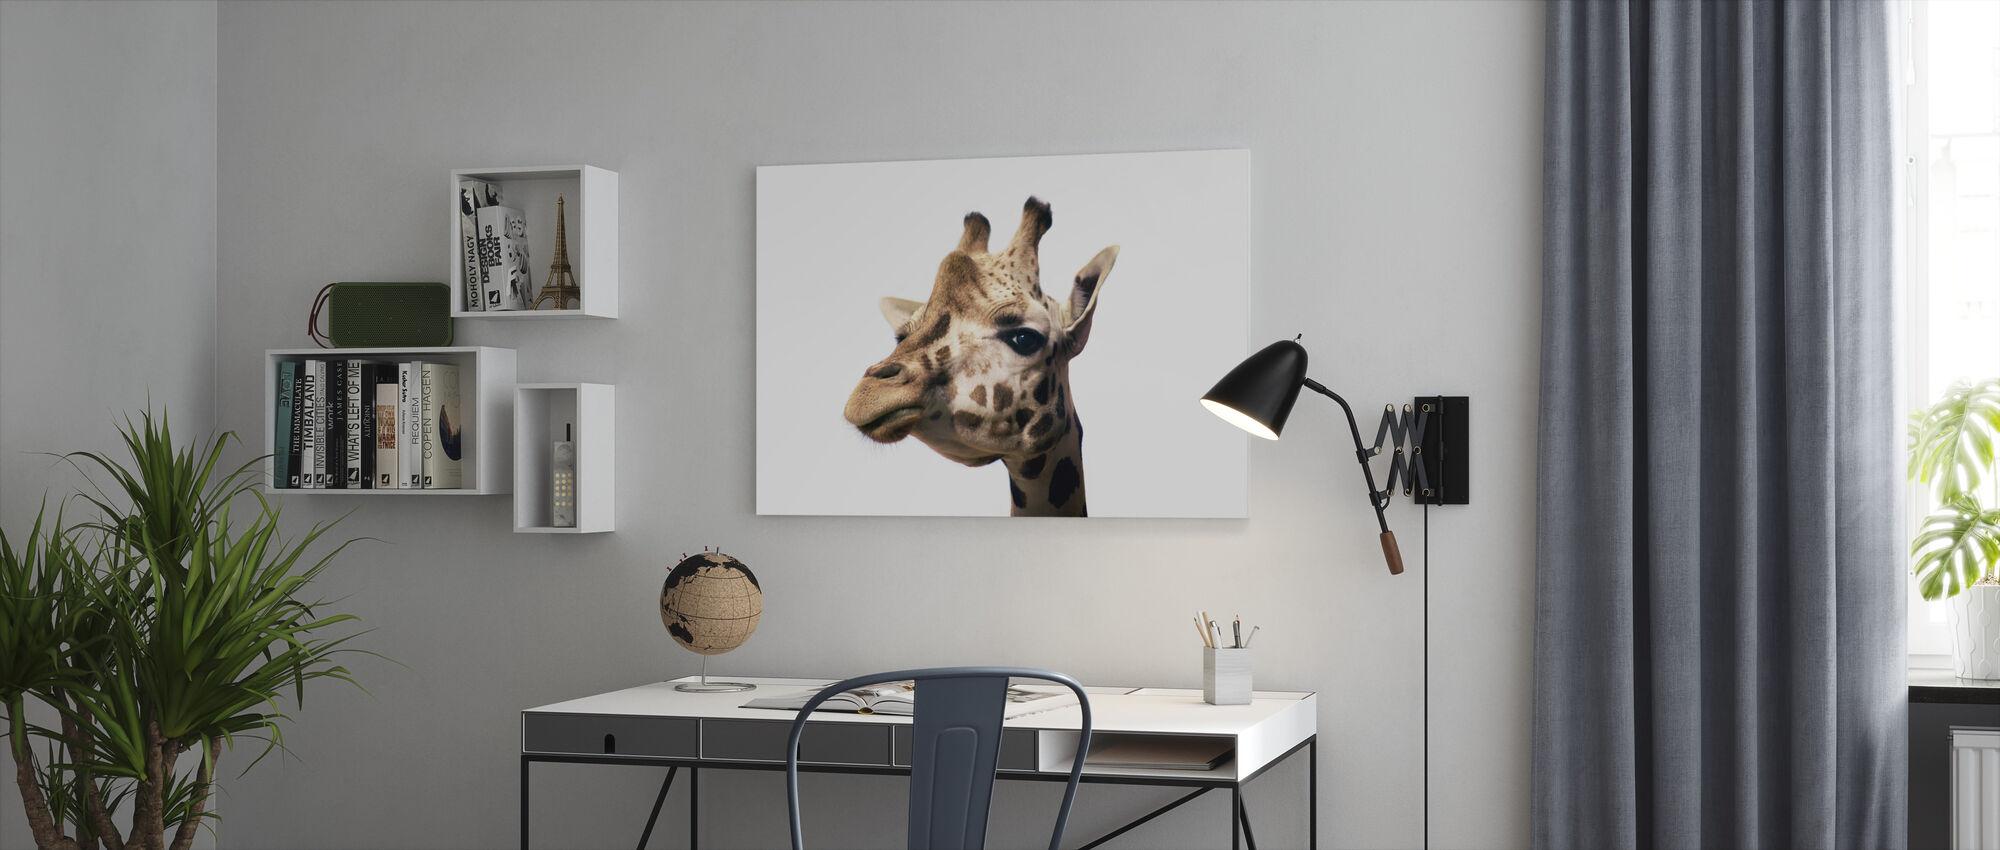 Portrait of a Giraffe - Canvas print - Office